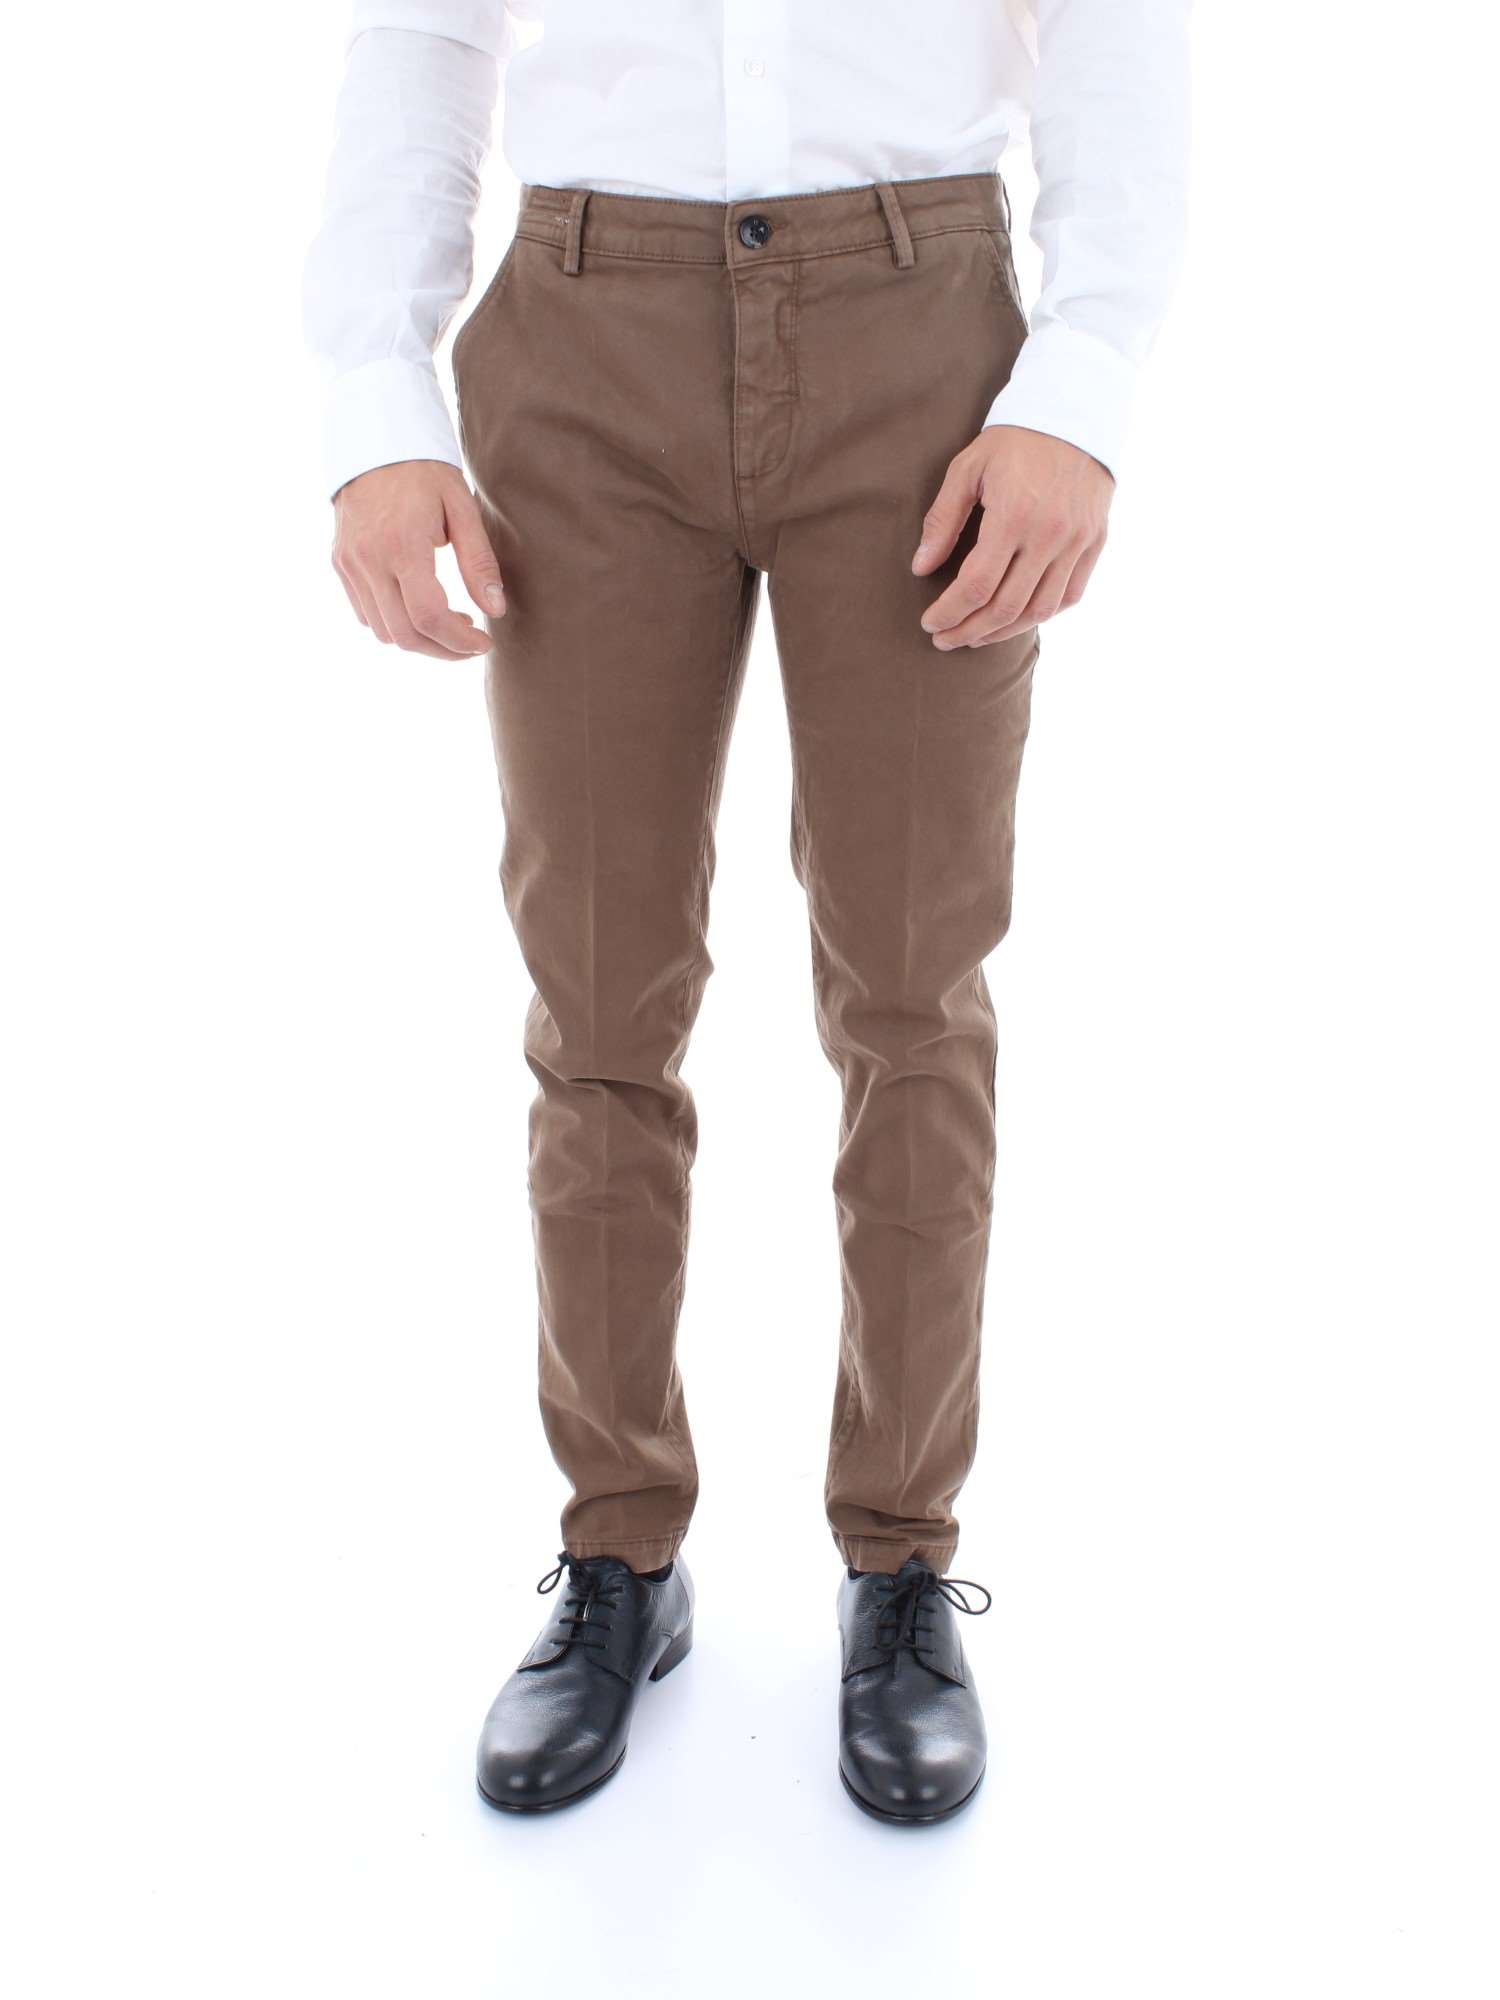 Pantalon brun Simmons Yan Story 05 clair A104 homme hiver automne RqRHTwxU